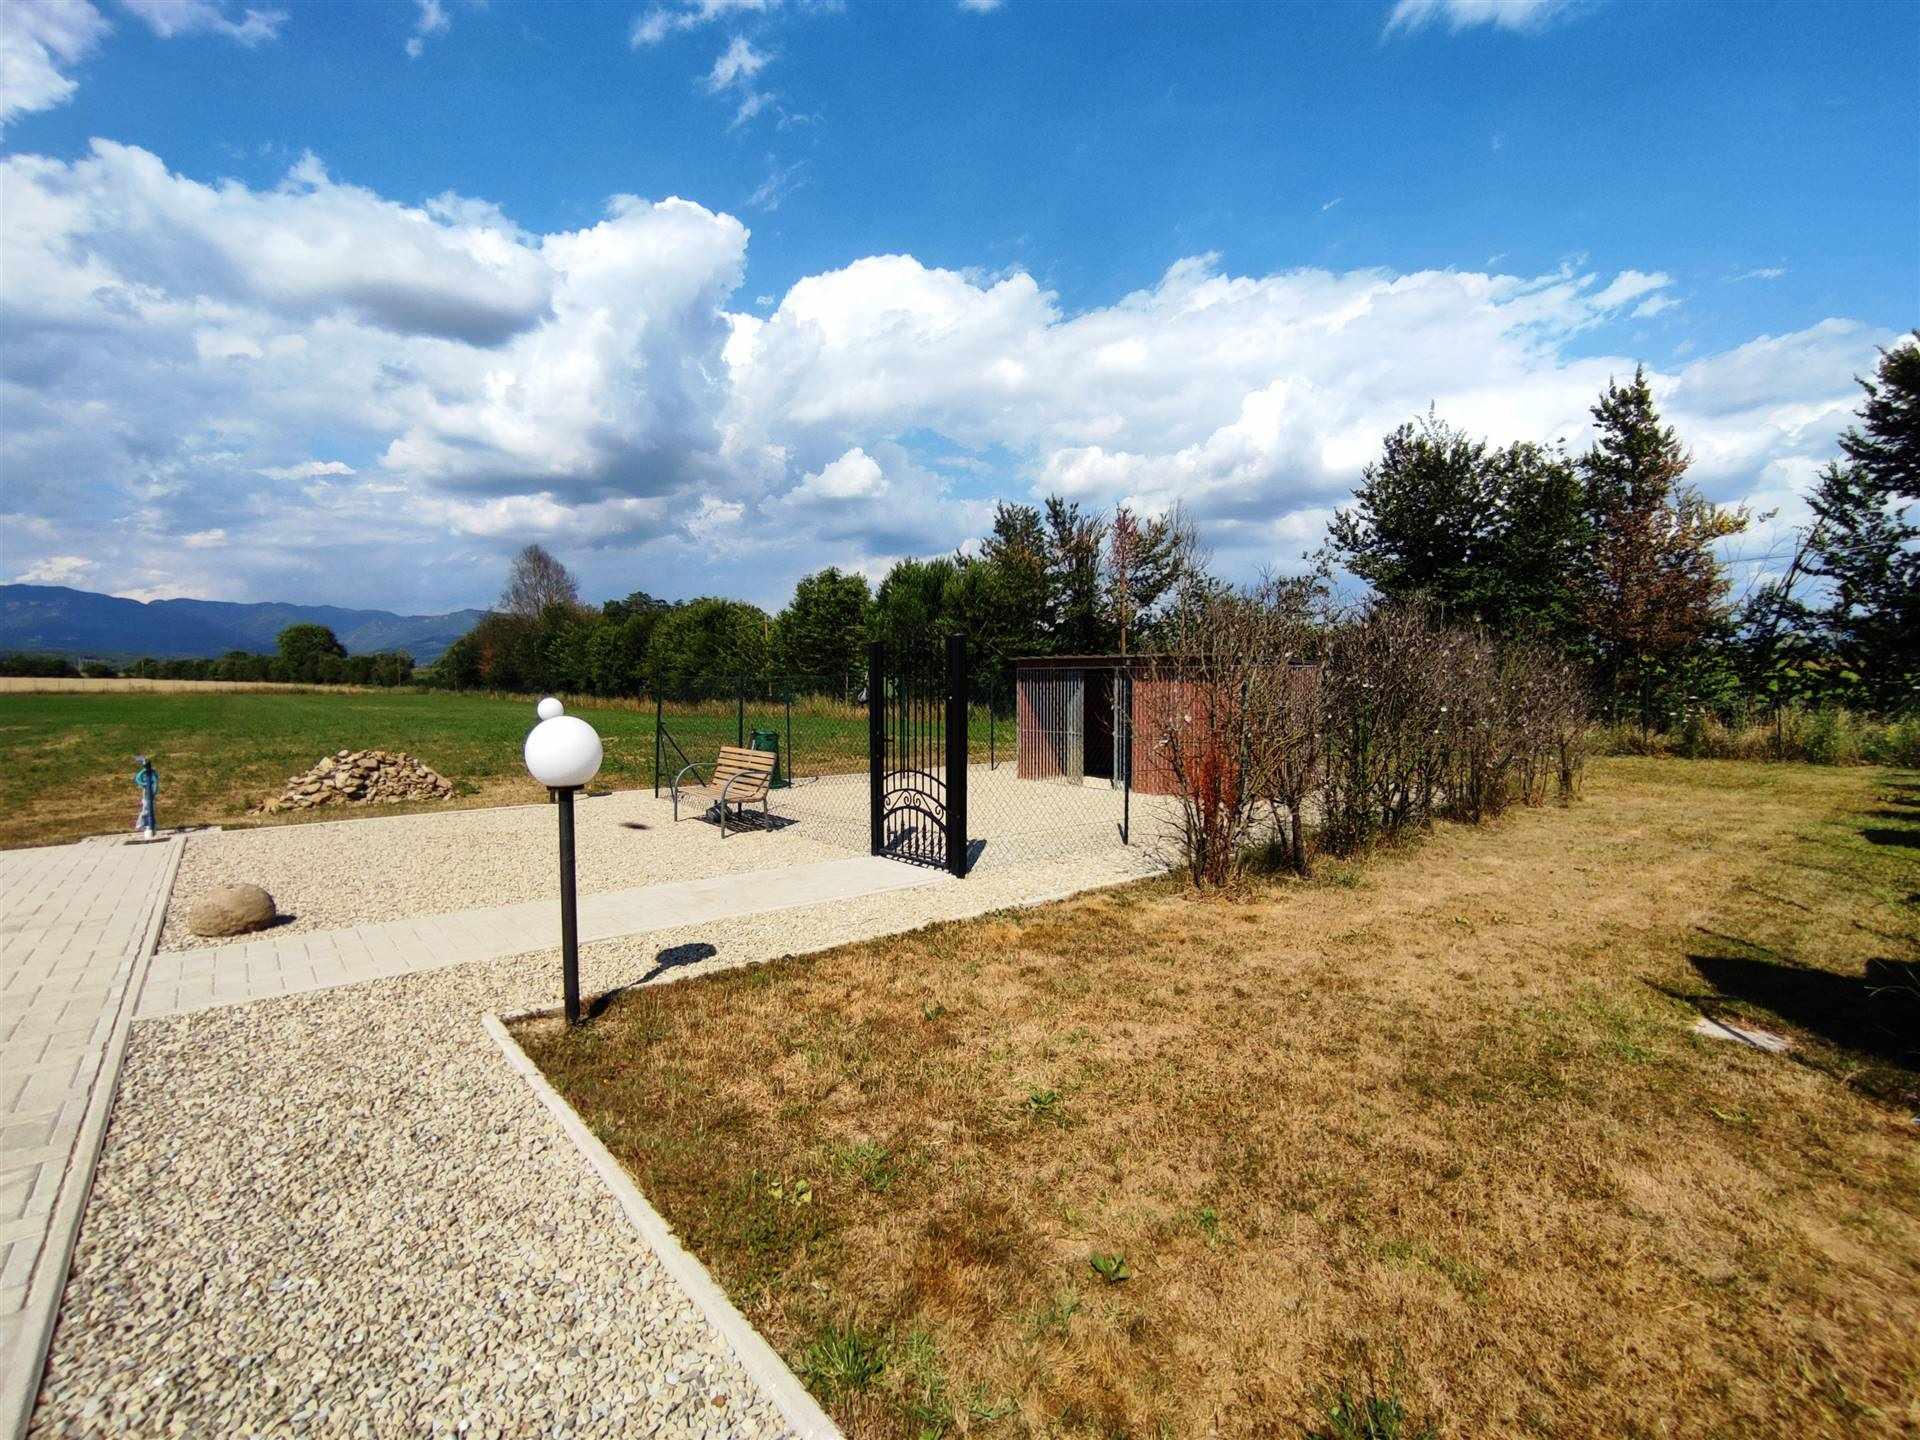 giardino e piazzale